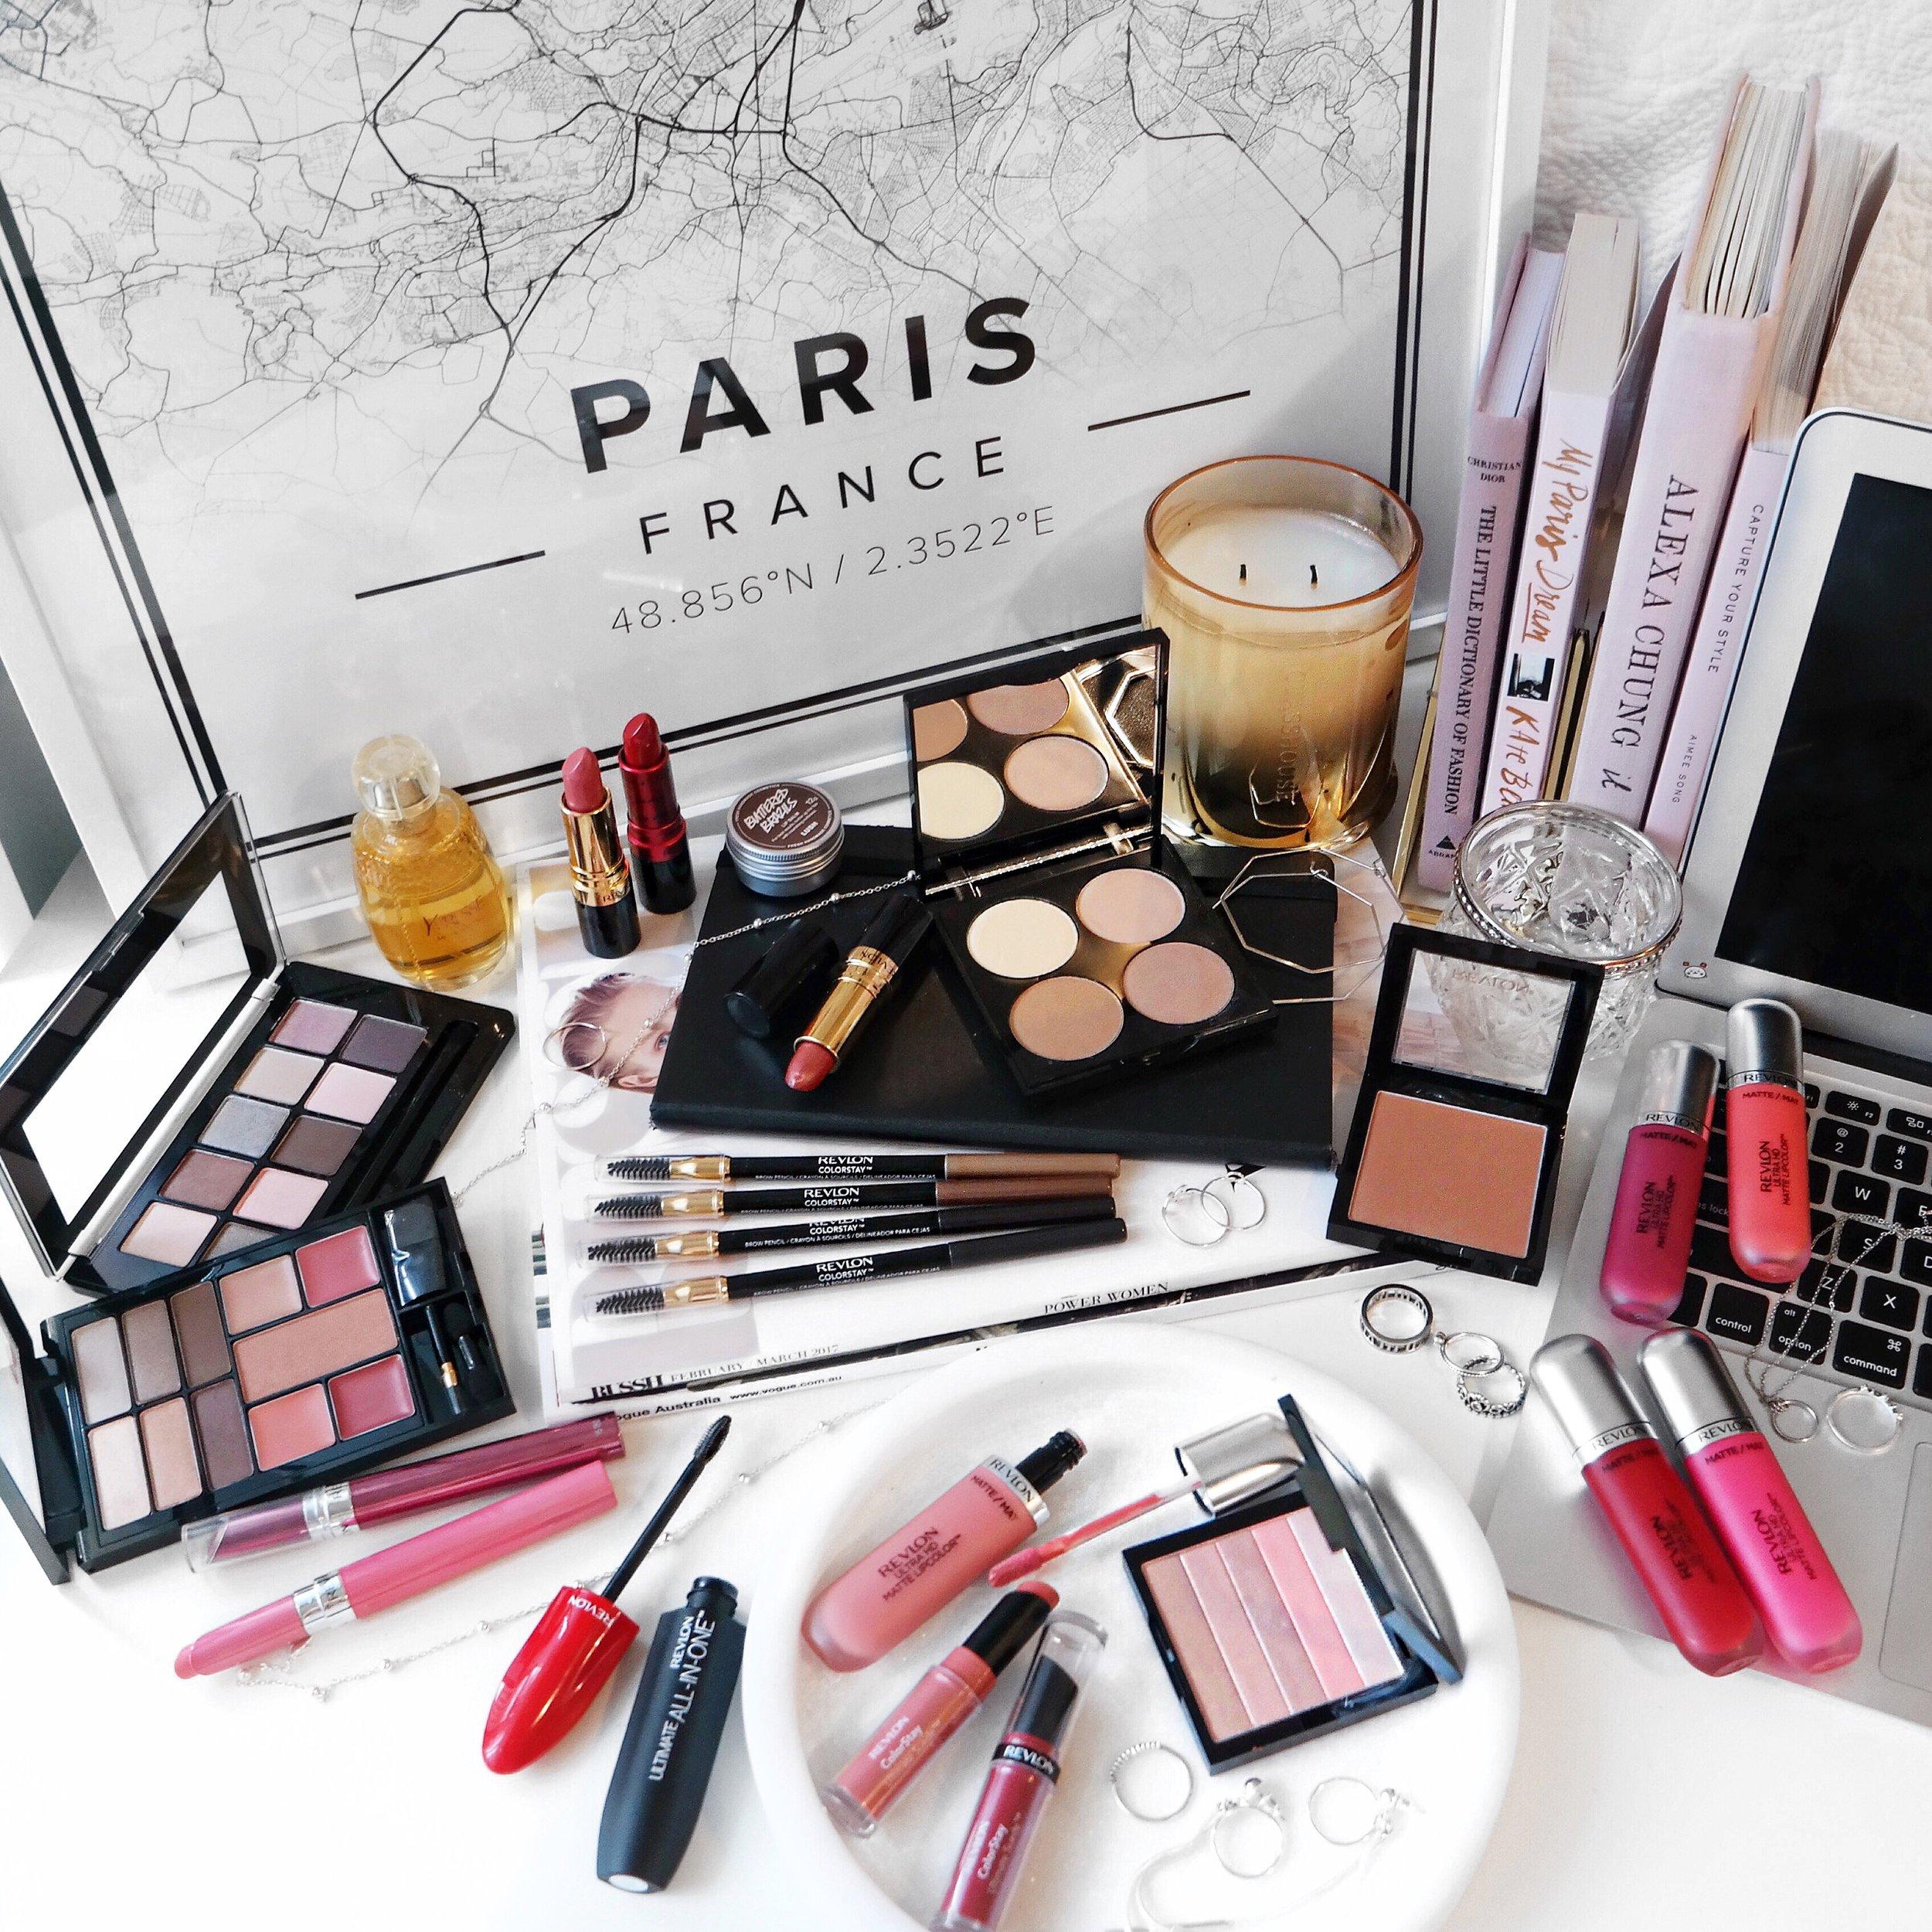 Revlon Makeup Haul Priceline Sale | Izzy Wears Blog